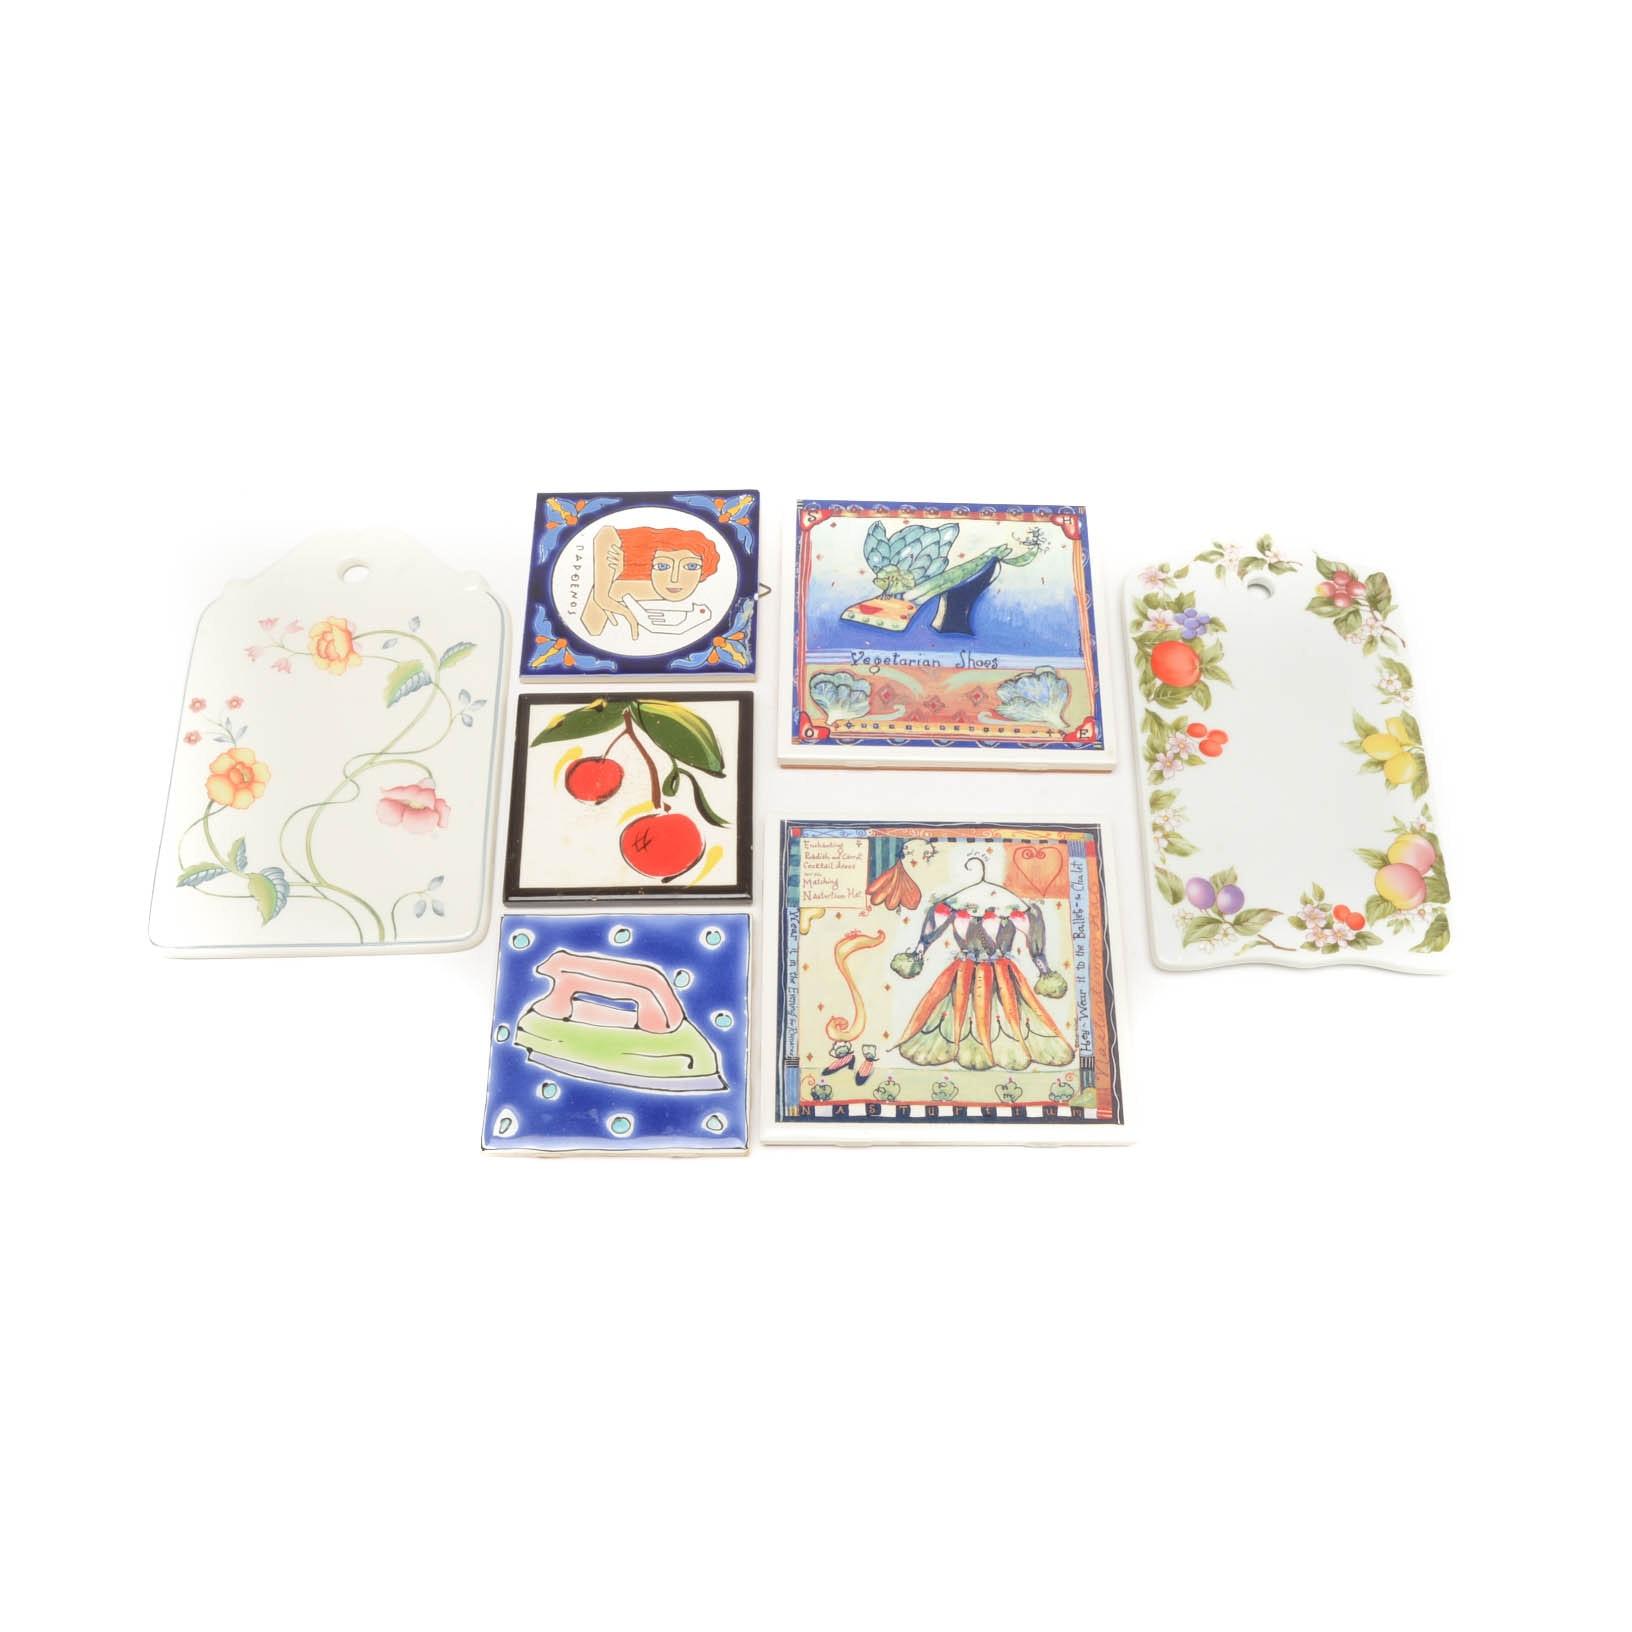 Seven Decorative Ceramic Trivets and Tiles